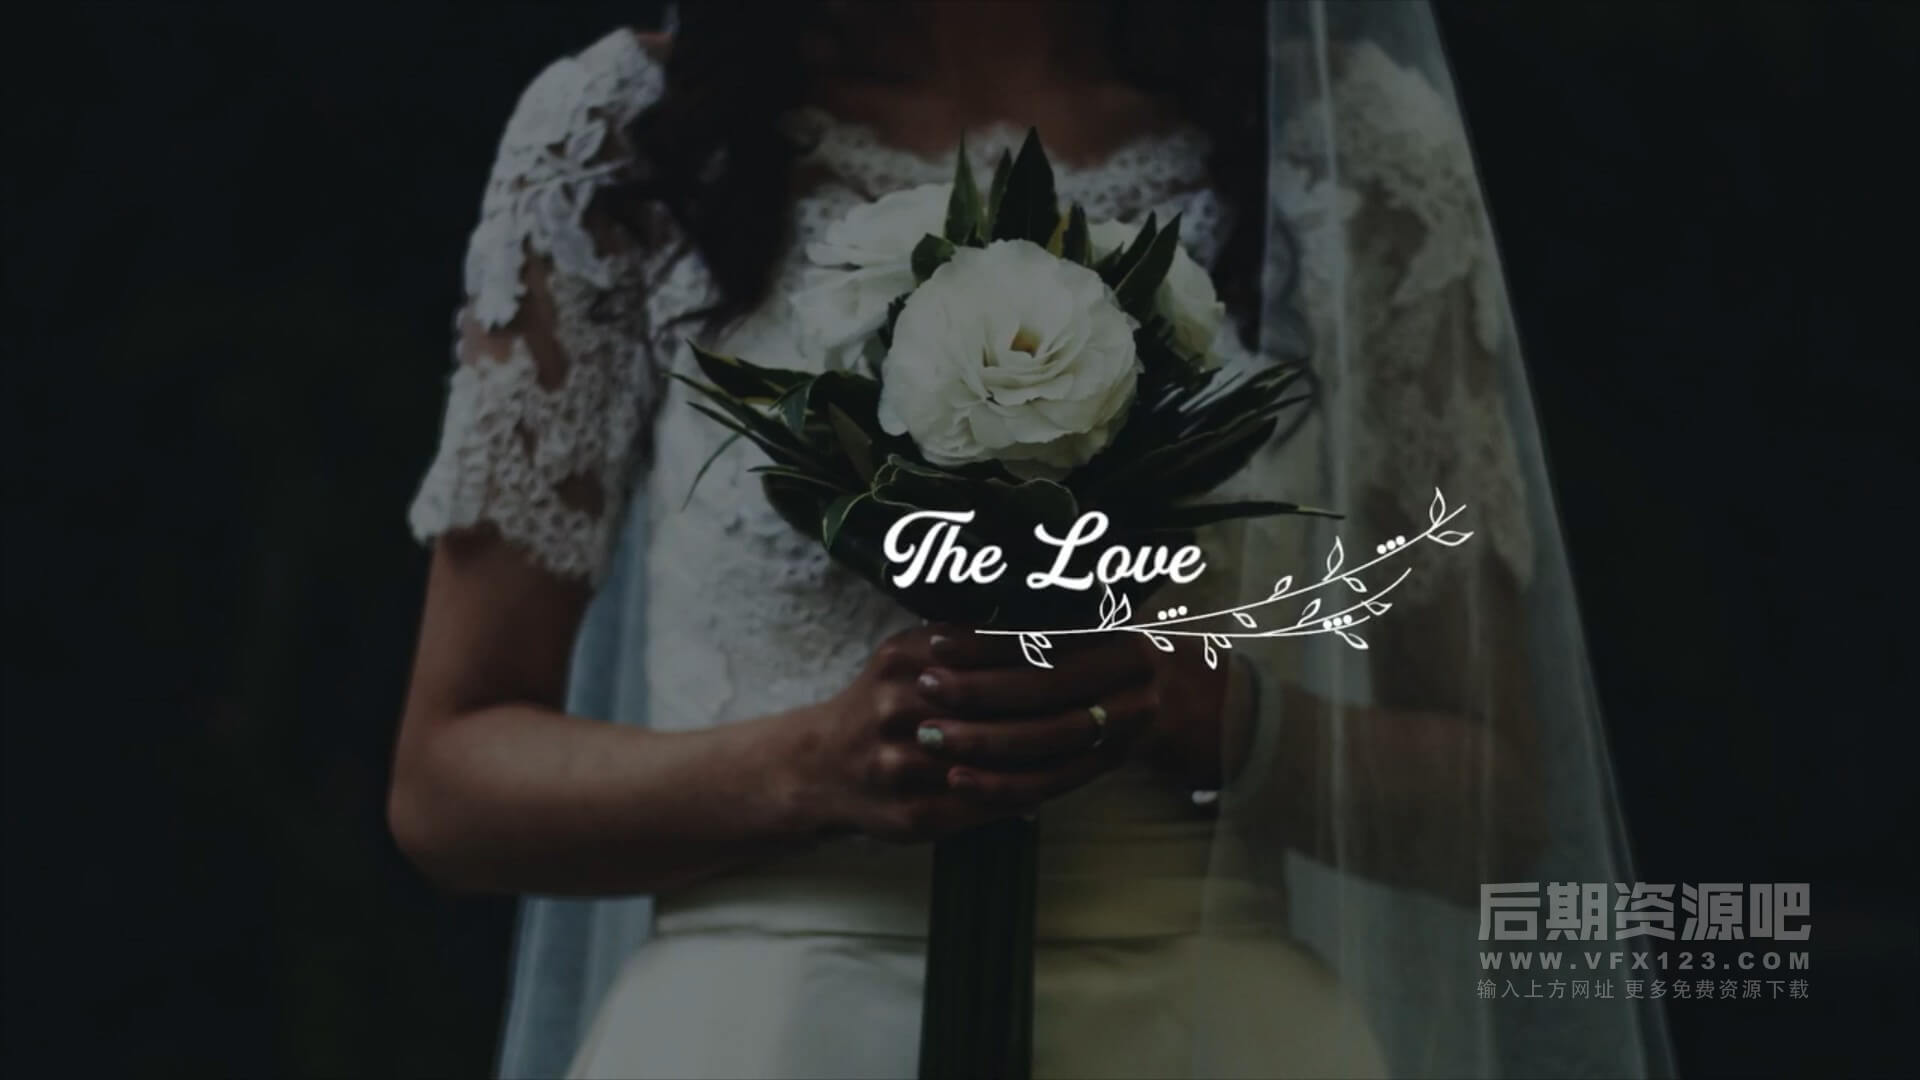 Fcpx标题插件 5组浪漫花纹婚礼人名日期MV标题模板 Wedding titles